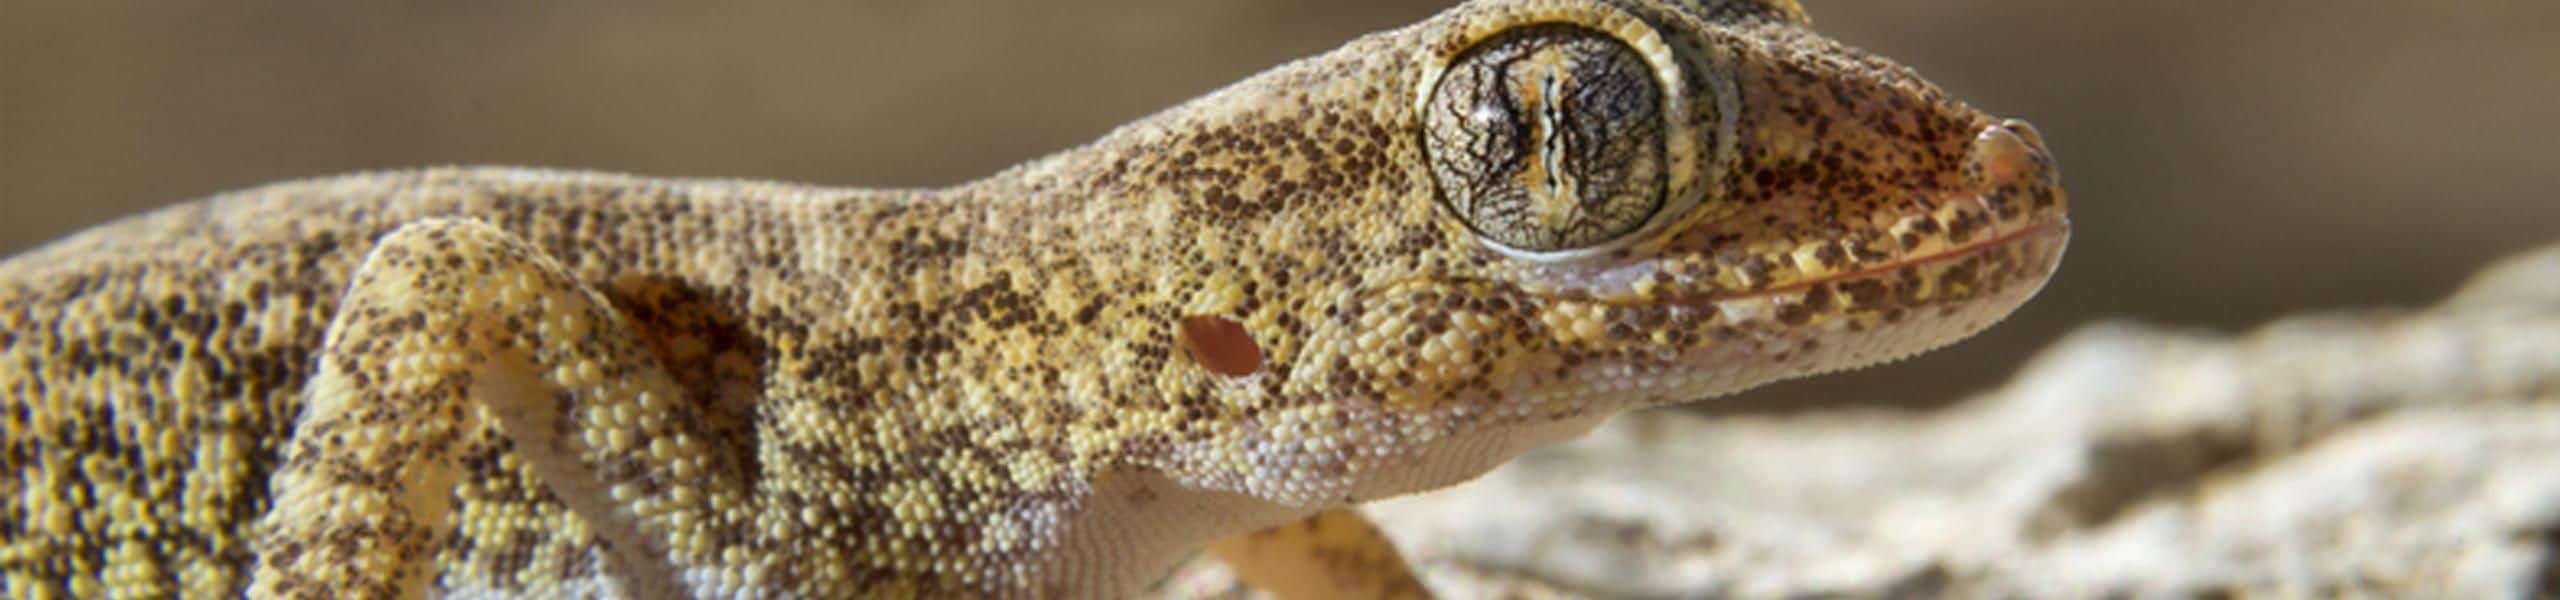 Short-fingered gecko